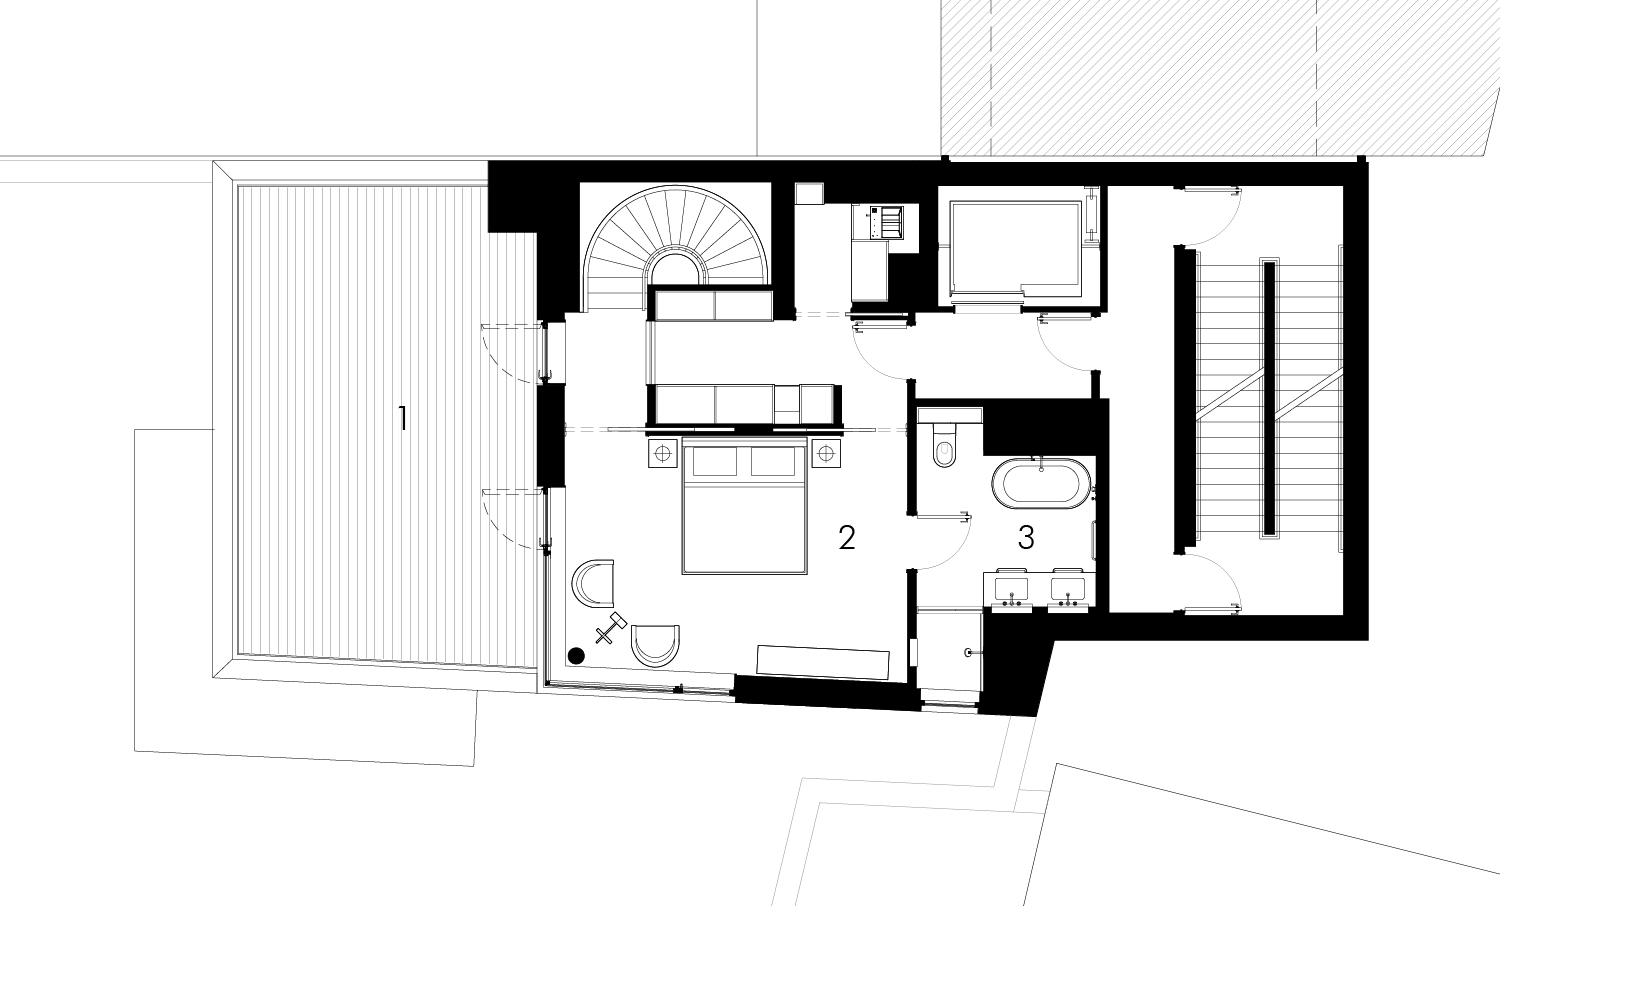 347 Bowery, Triplex third floor, Selldorf Architects